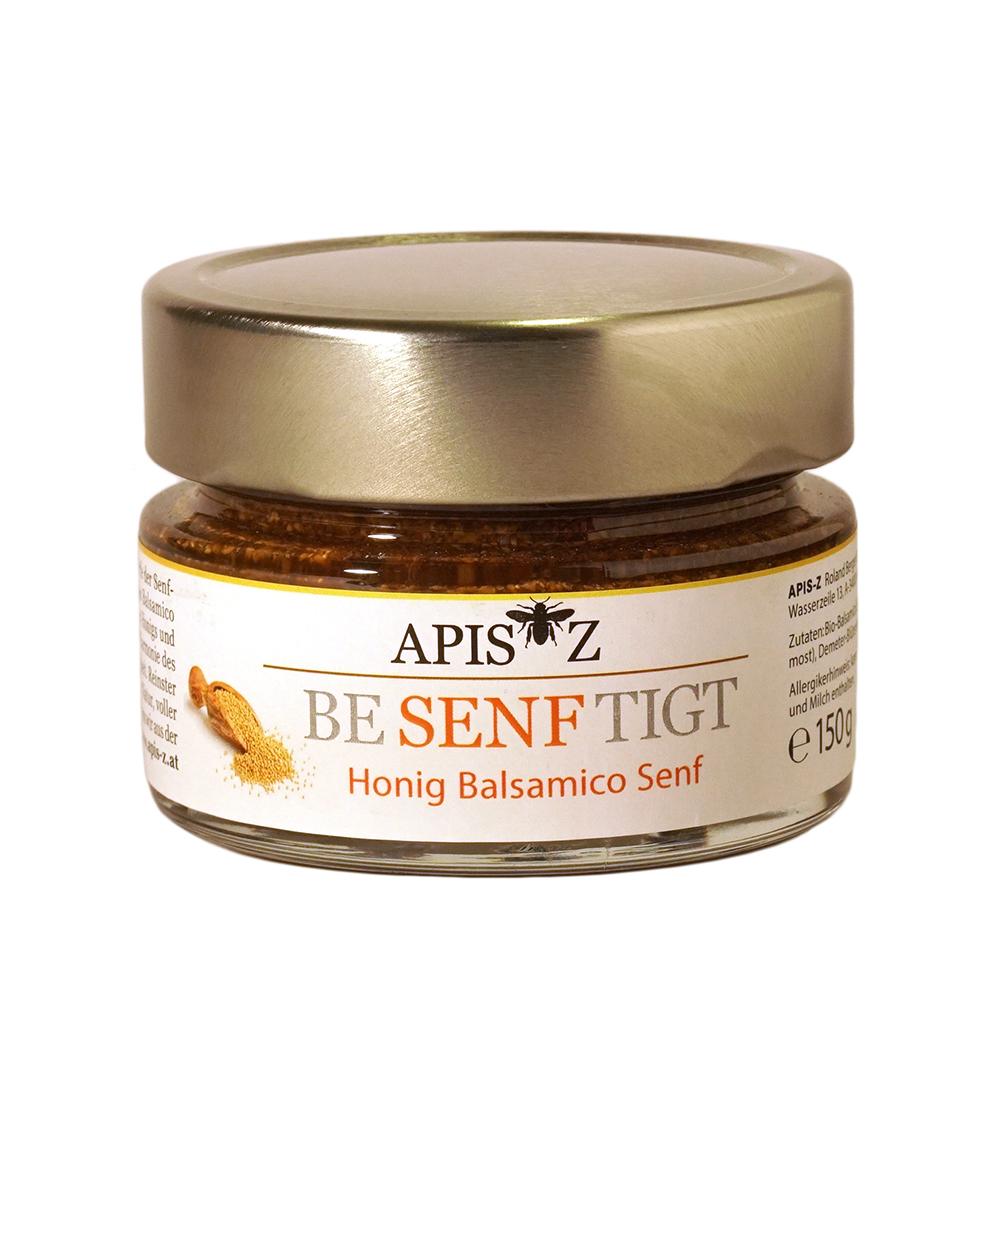 Be SENF tigt - Honig Balsamico Senf